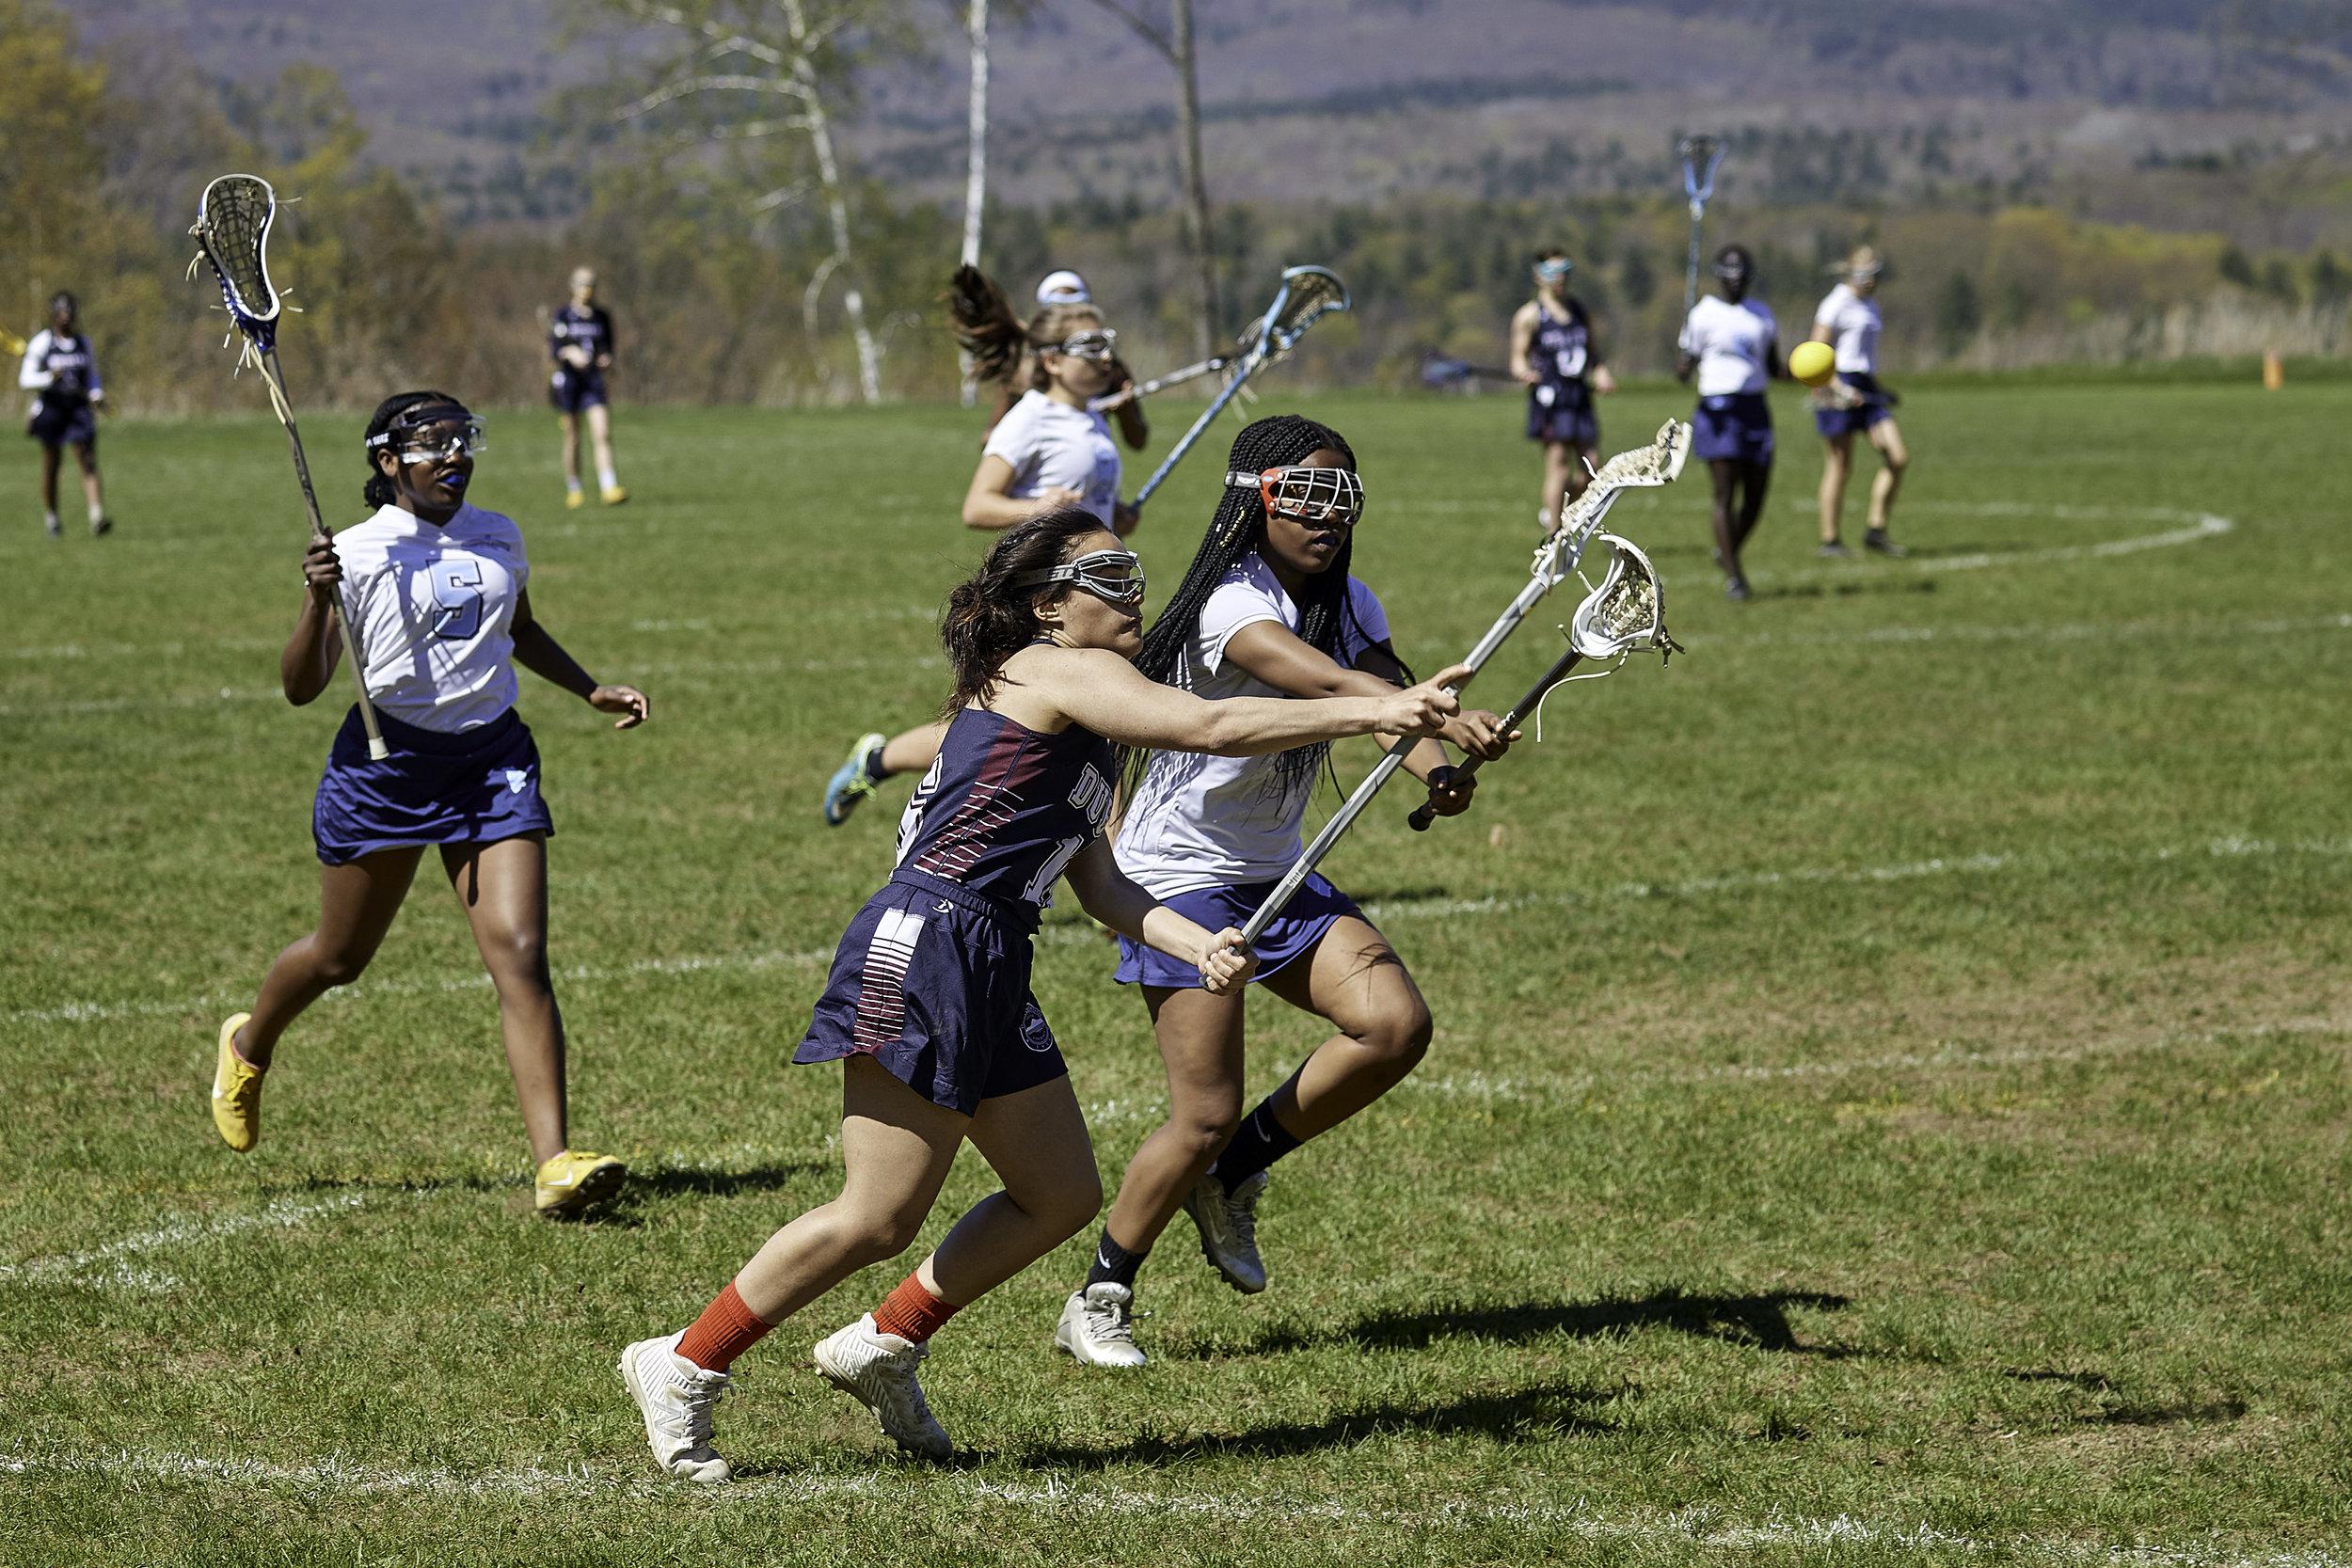 Girls Lacrosse vs. Stoneleigh Burnham School - May 11, 2019 - May 10, 2019193326.jpg